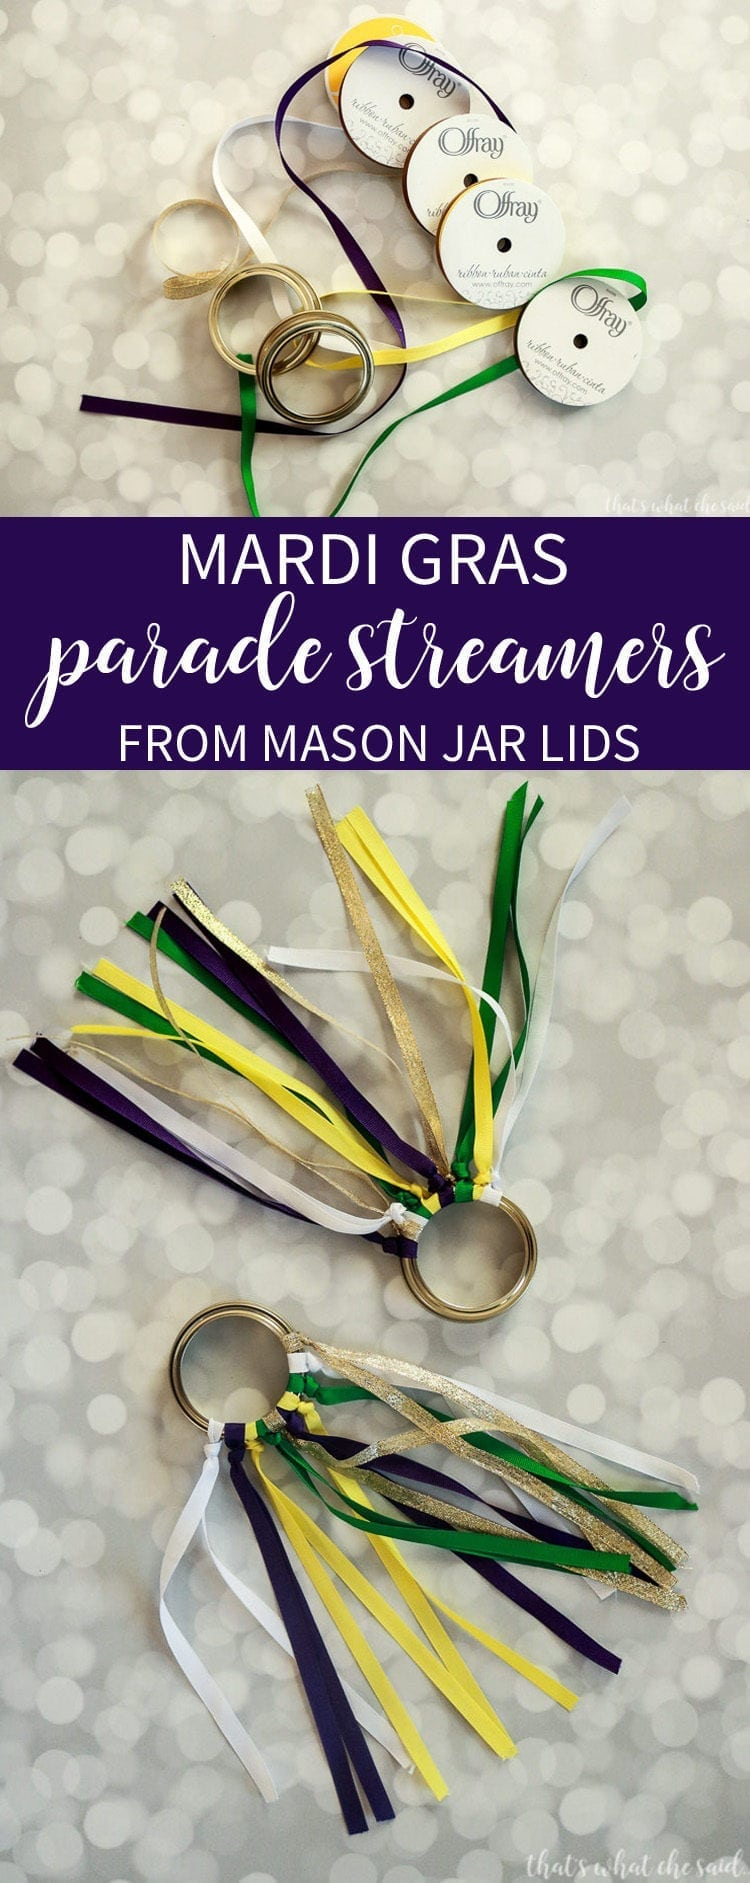 Mardi Gras Parade Streamers made with Mason Jar Lids and Ribbon. Easy Mardi Gras Craft Idea